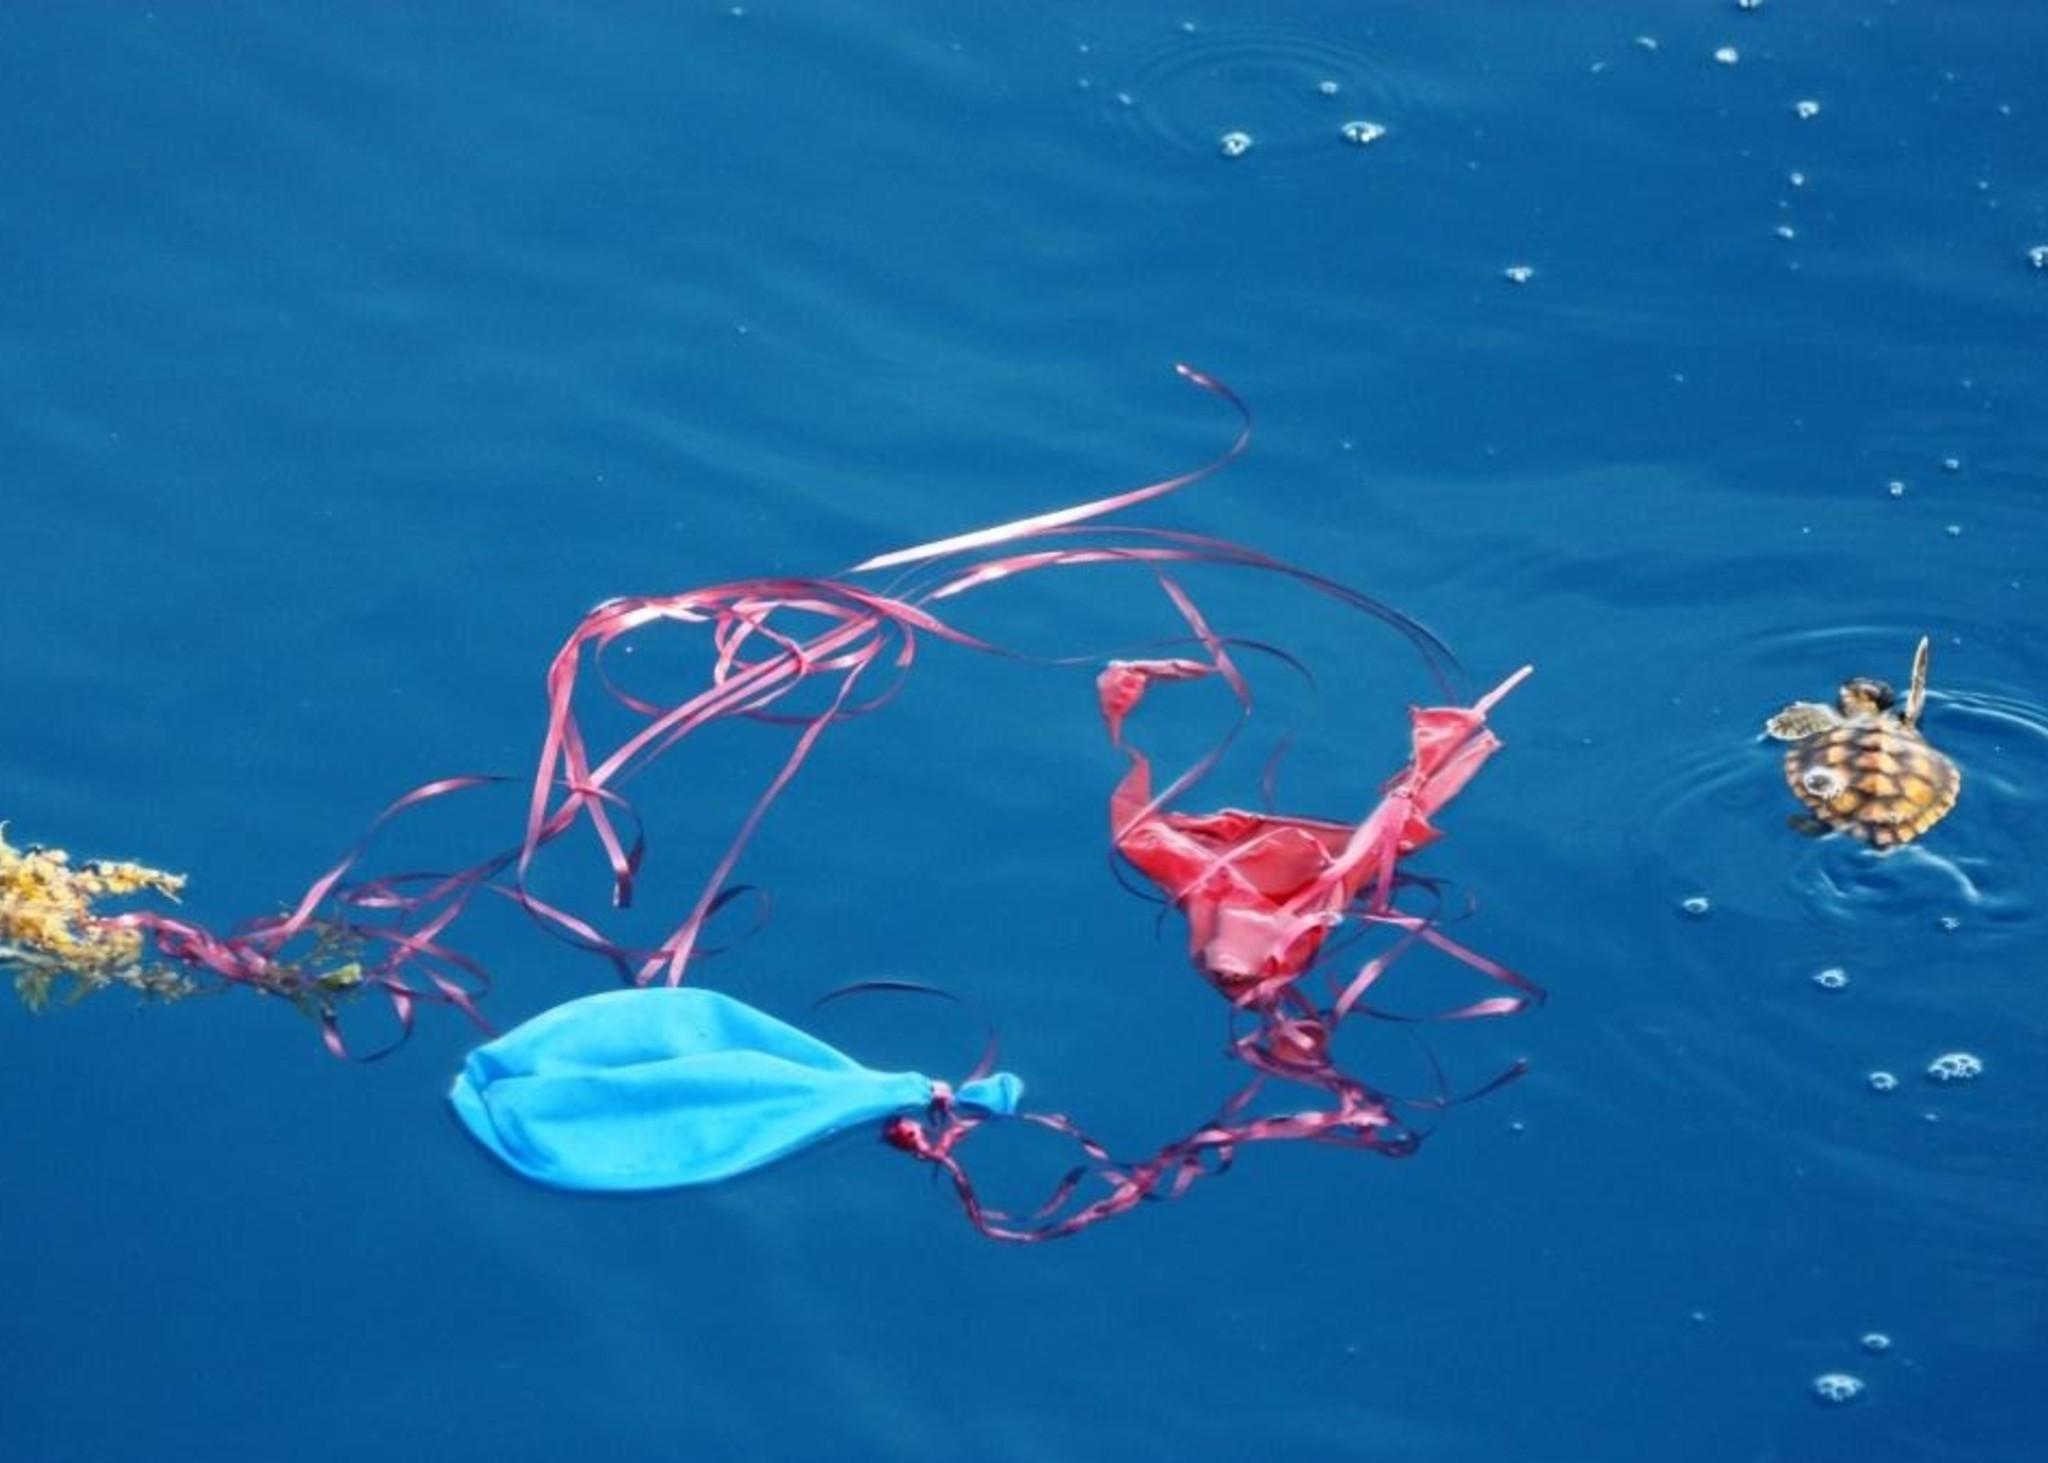 pollution balloons turtle